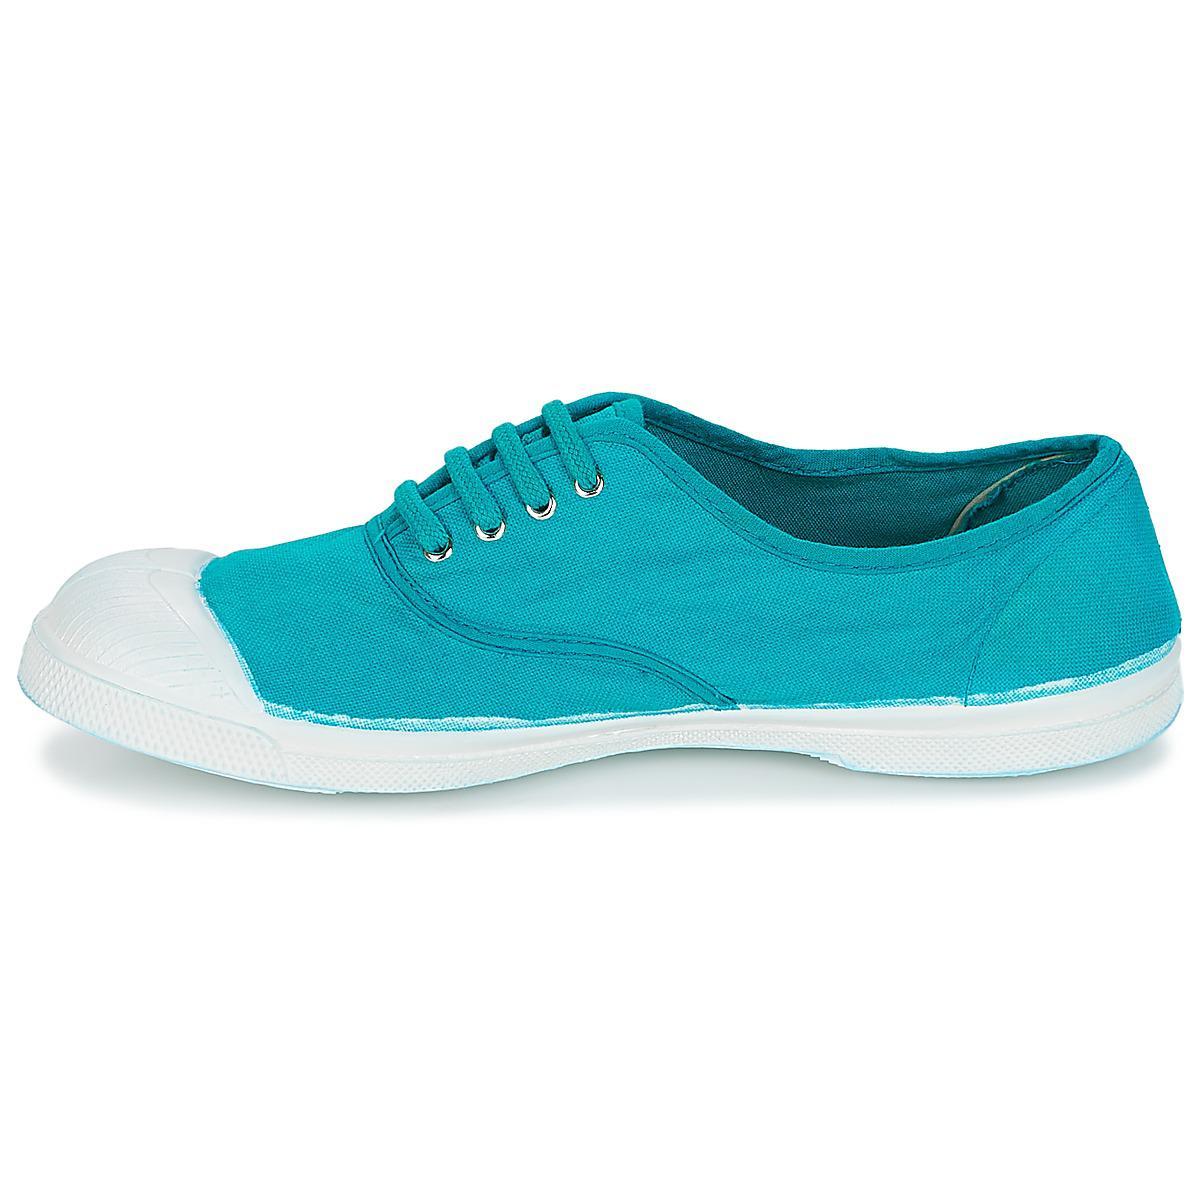 Bensimon Tennis Lacet Women's Shoes (trainers) In Blue